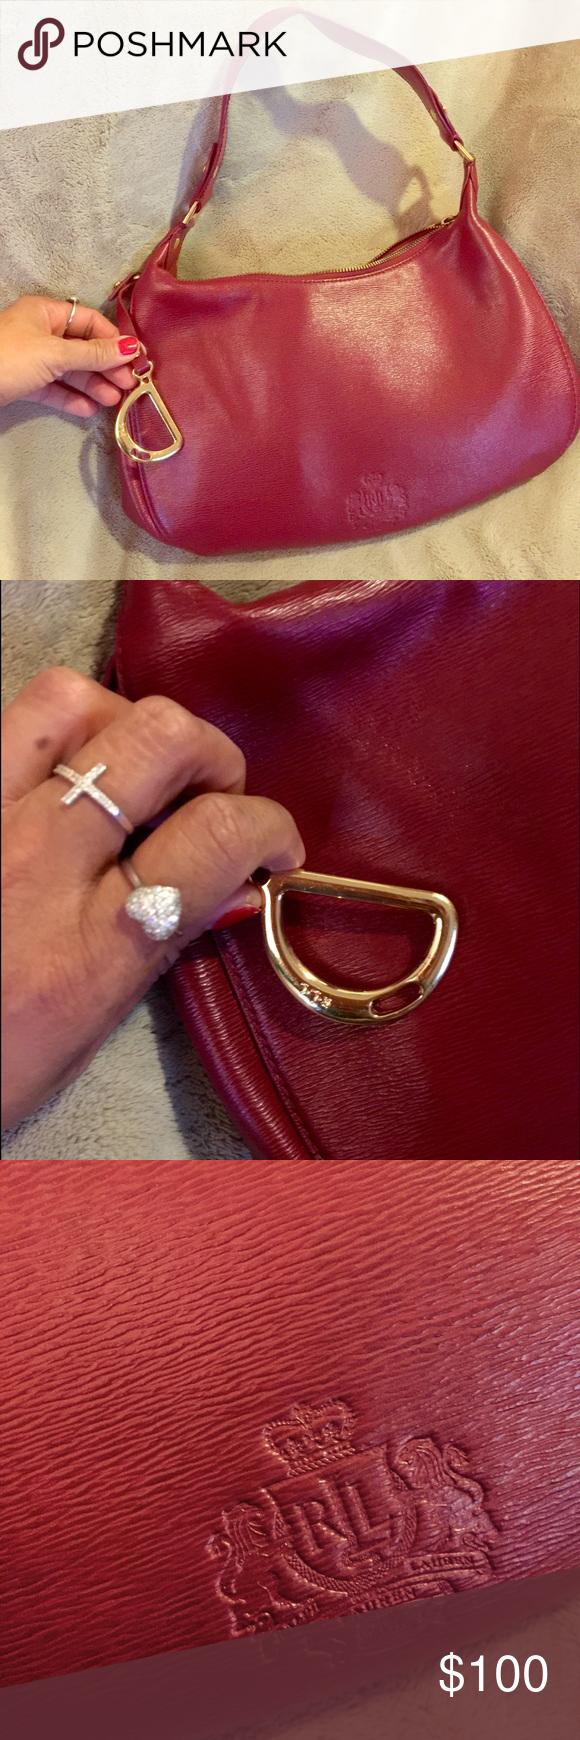 5889c2c020 Excellent condition Vintage Ralph Lauren bag Used once